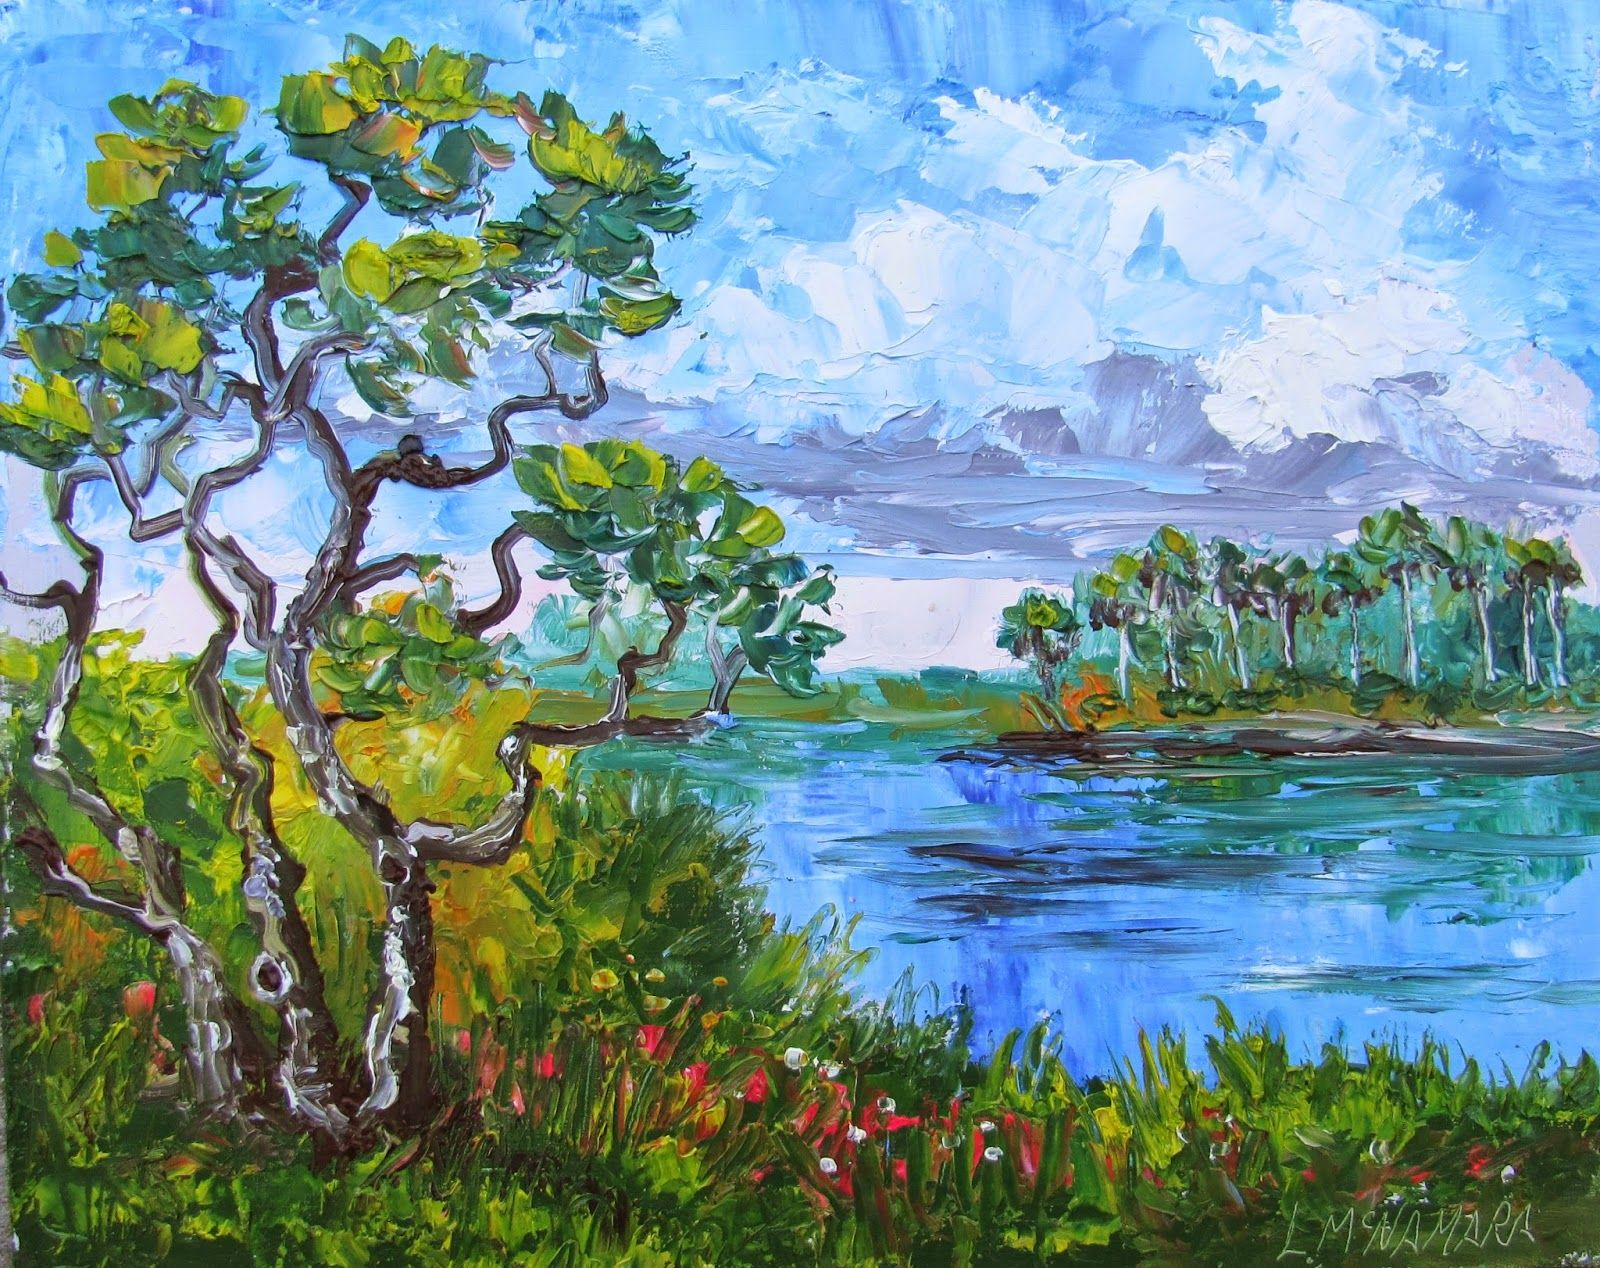 Storm Clouds Over The Savannas: Lori McNamara.